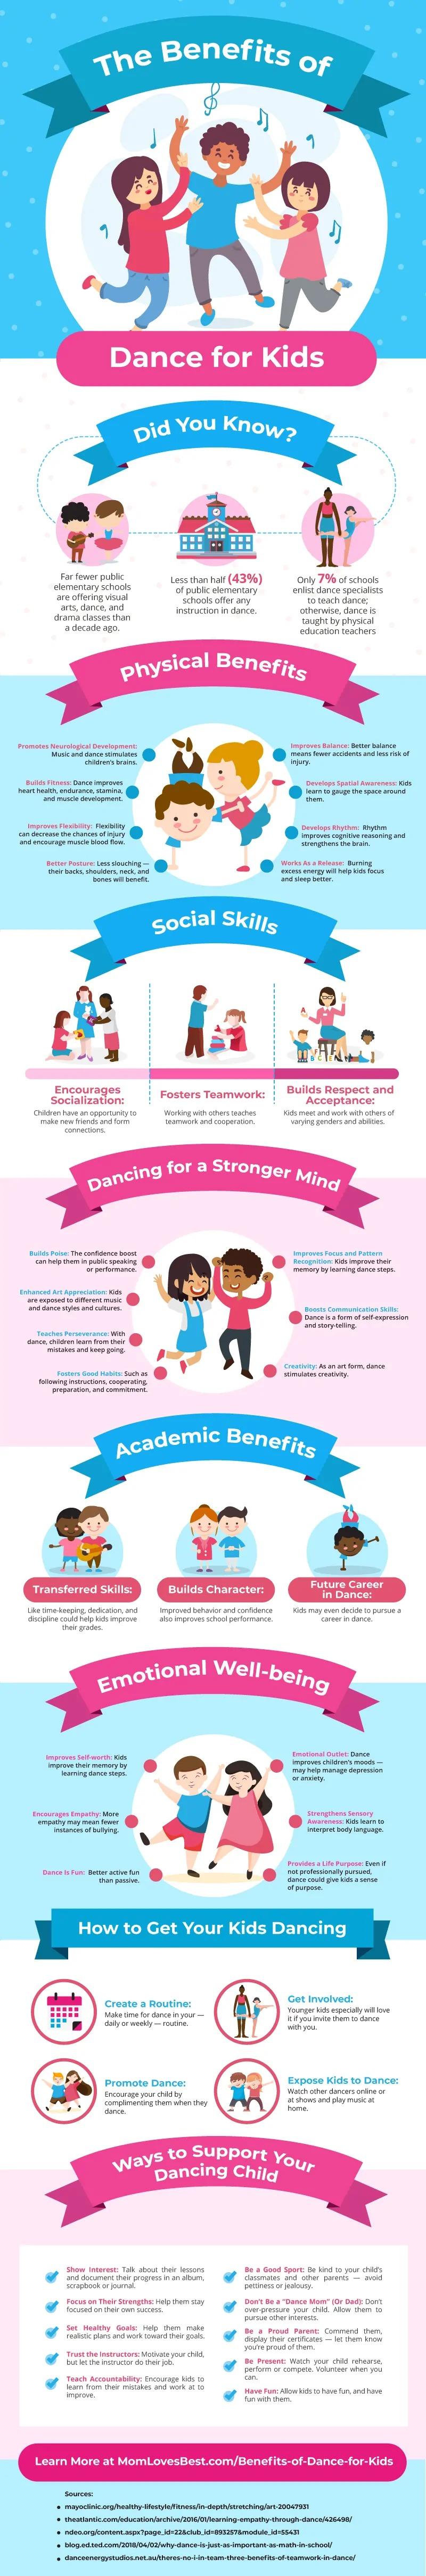 Benefits-of-Dance-for-Kids-Infographic.jpg